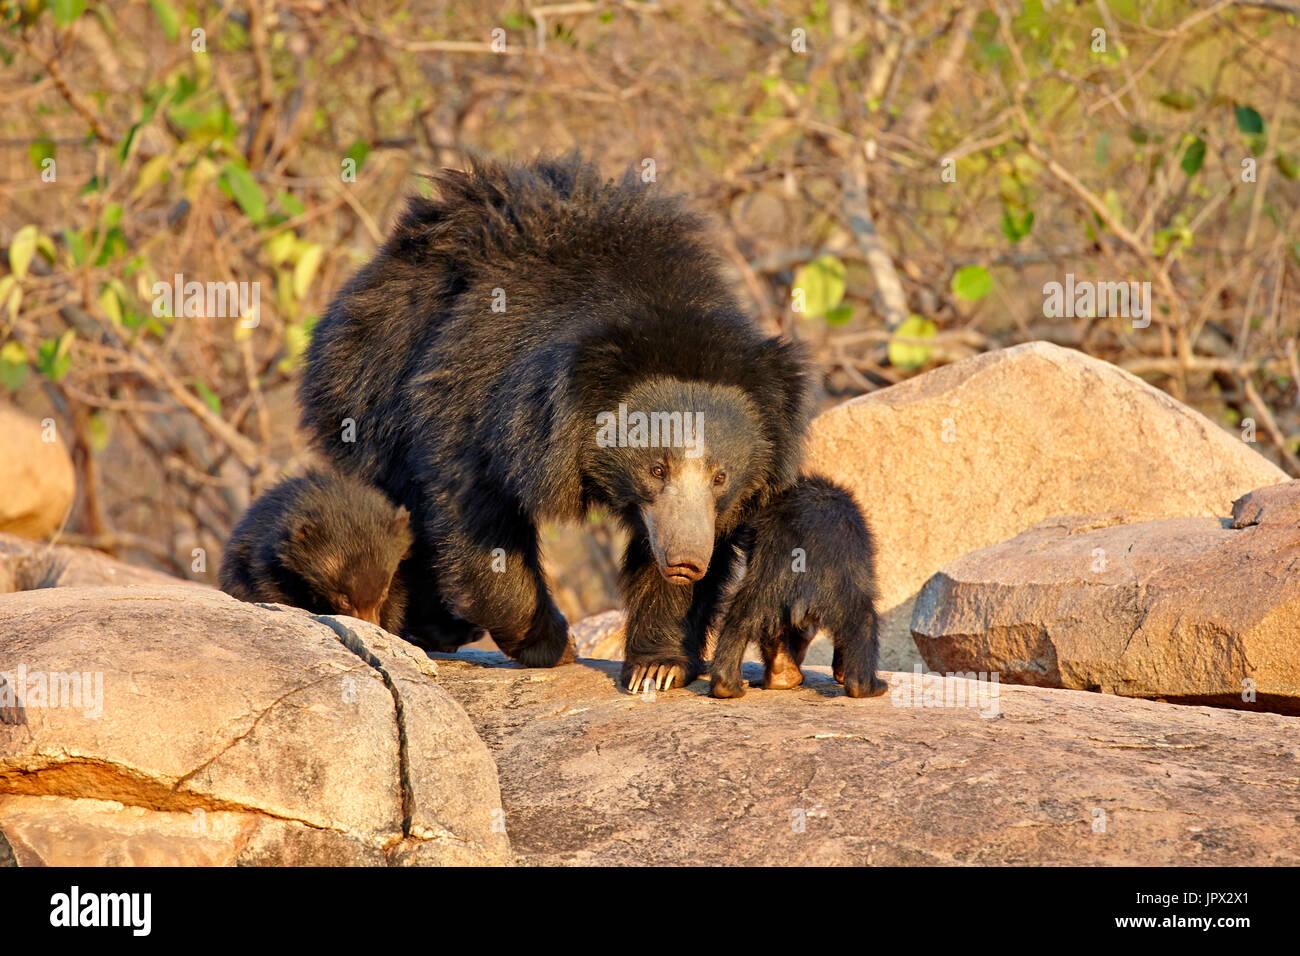 Sloth bear and youngs - Sandur Mountain Range India - Stock Image